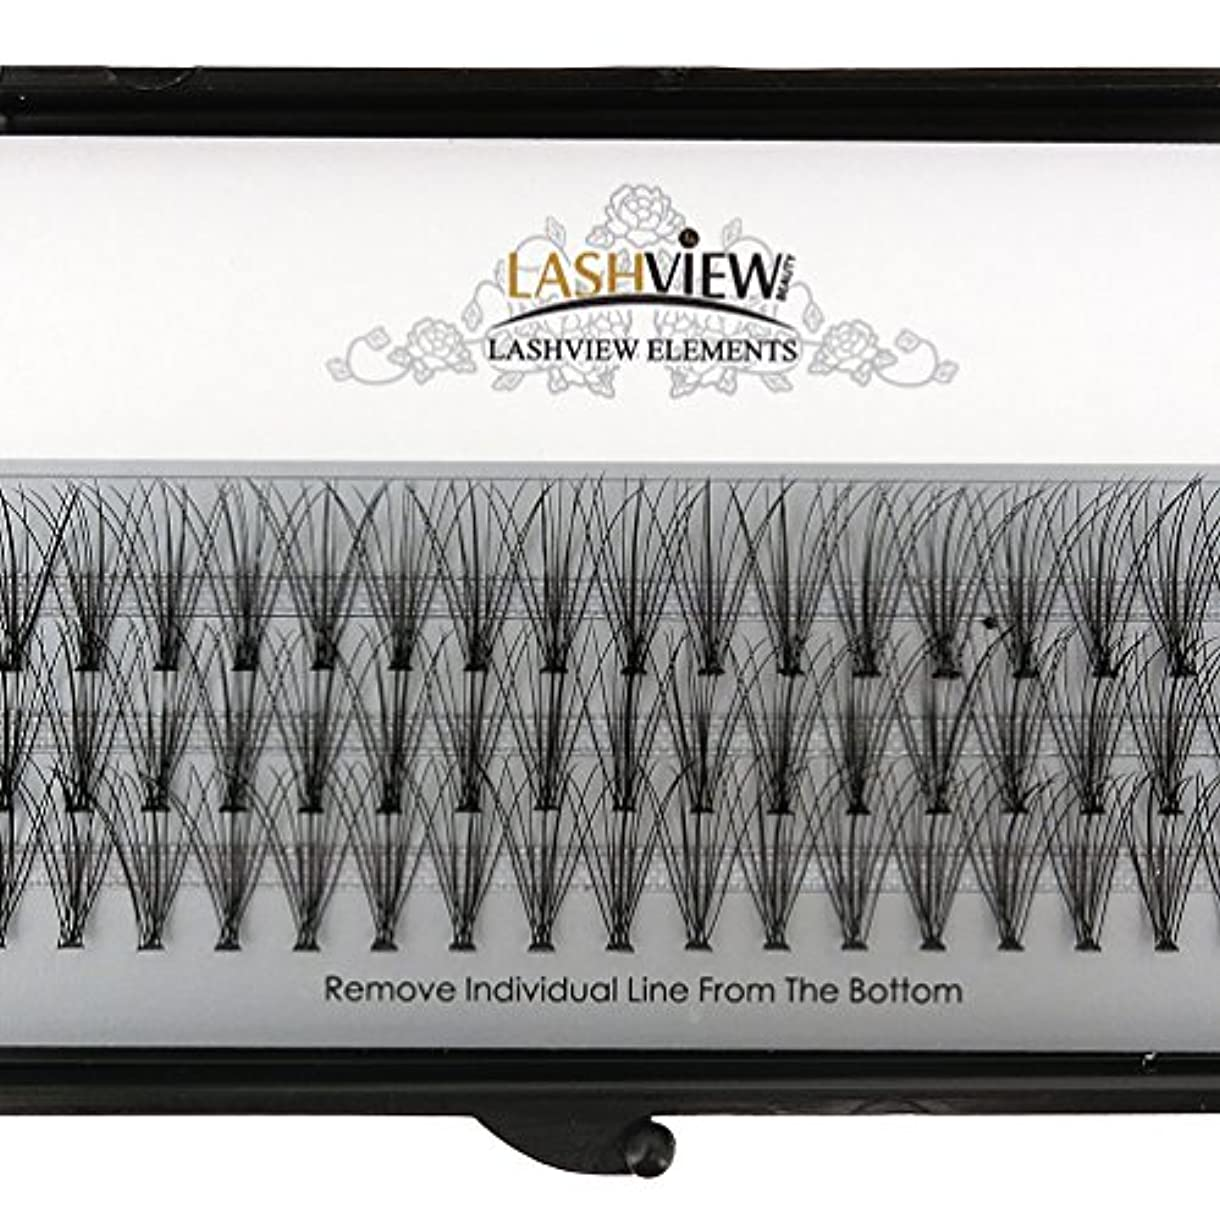 LASHVIEW 高品質まつげエクステ太さ0.10mm Cカール フレア セルフ用 素材 10本束12mm マツエク